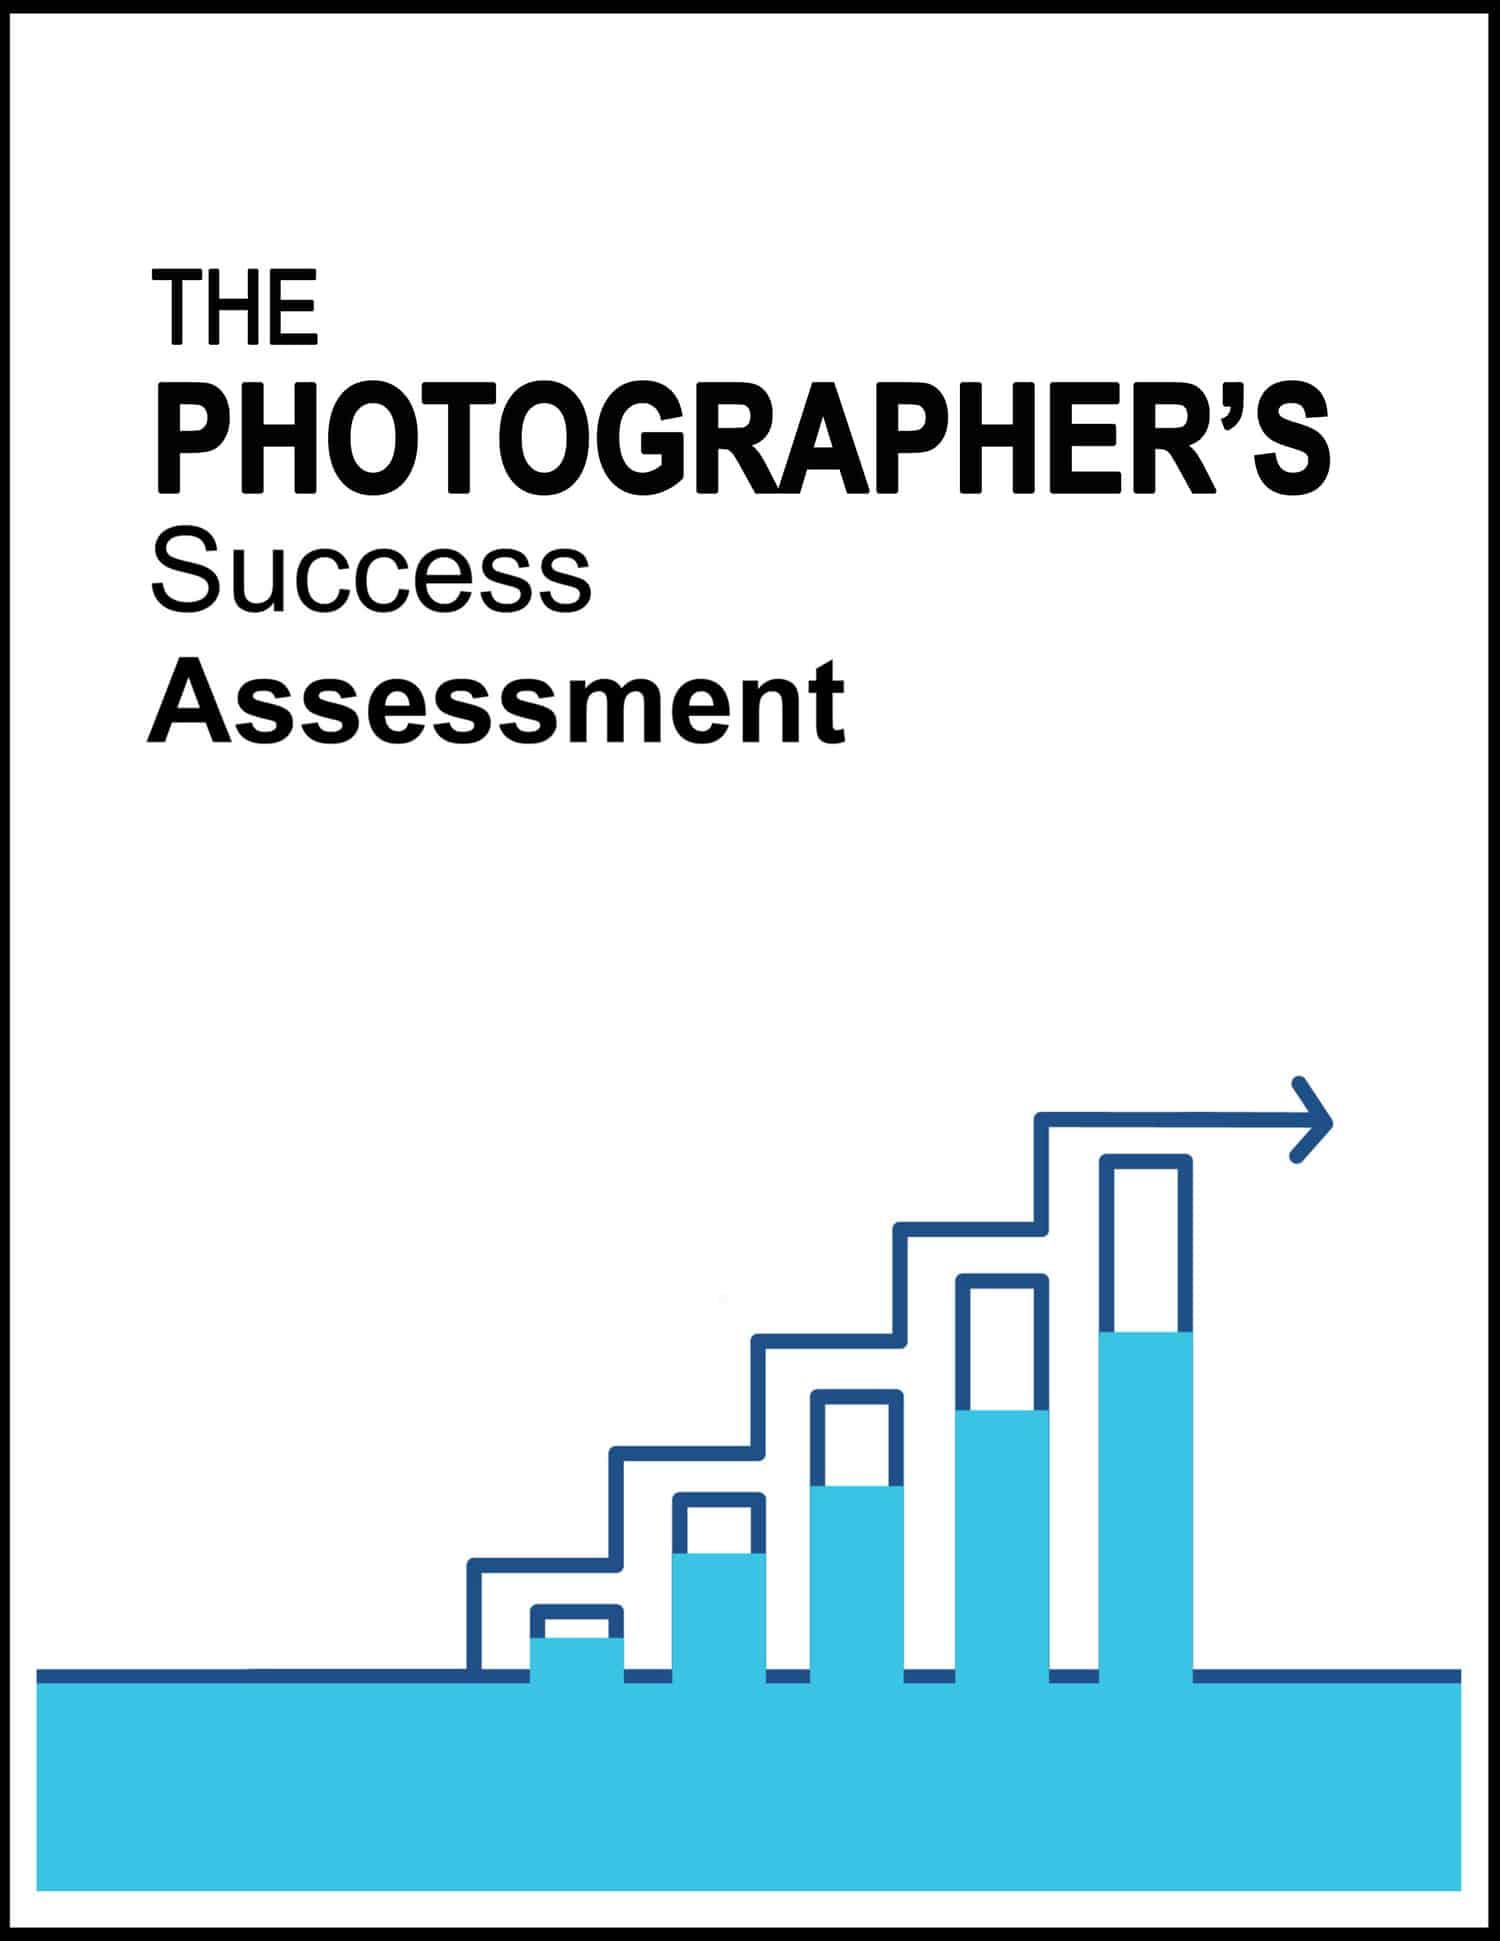 thephotographersuccessassessment